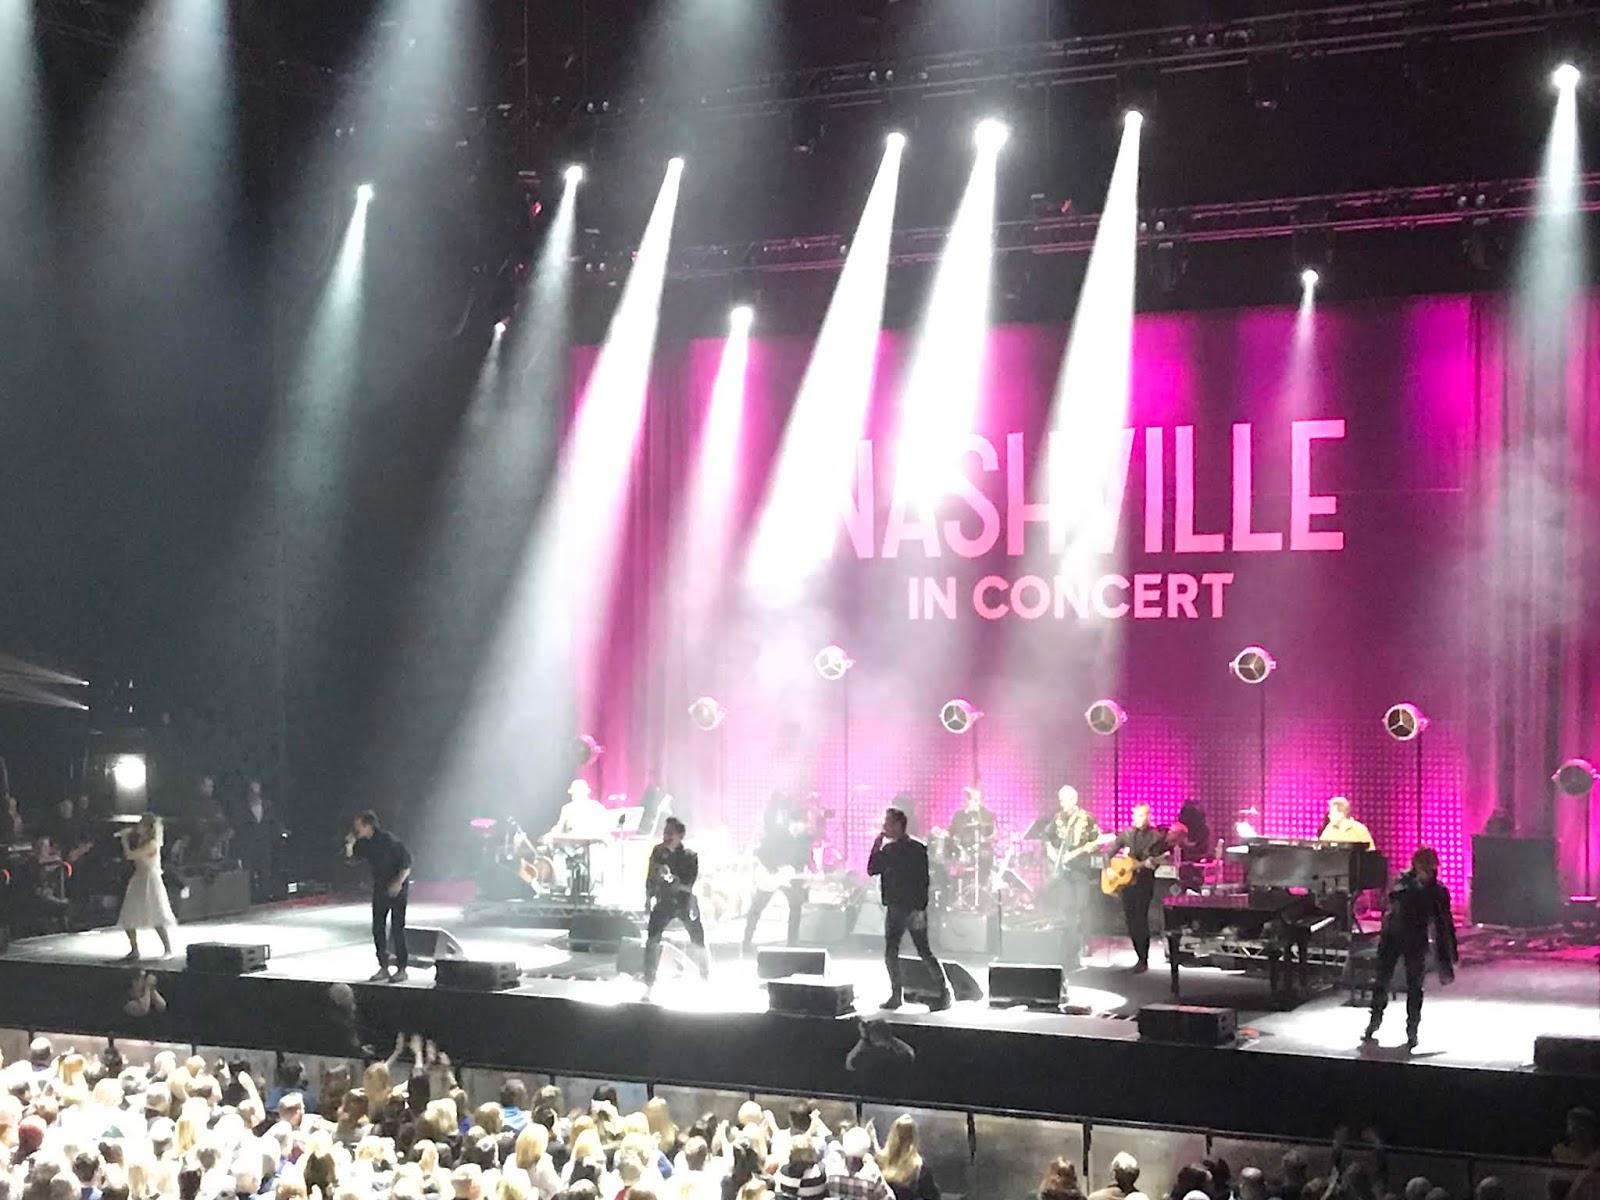 Nashville, Nashies, Farewell tour, concert, live